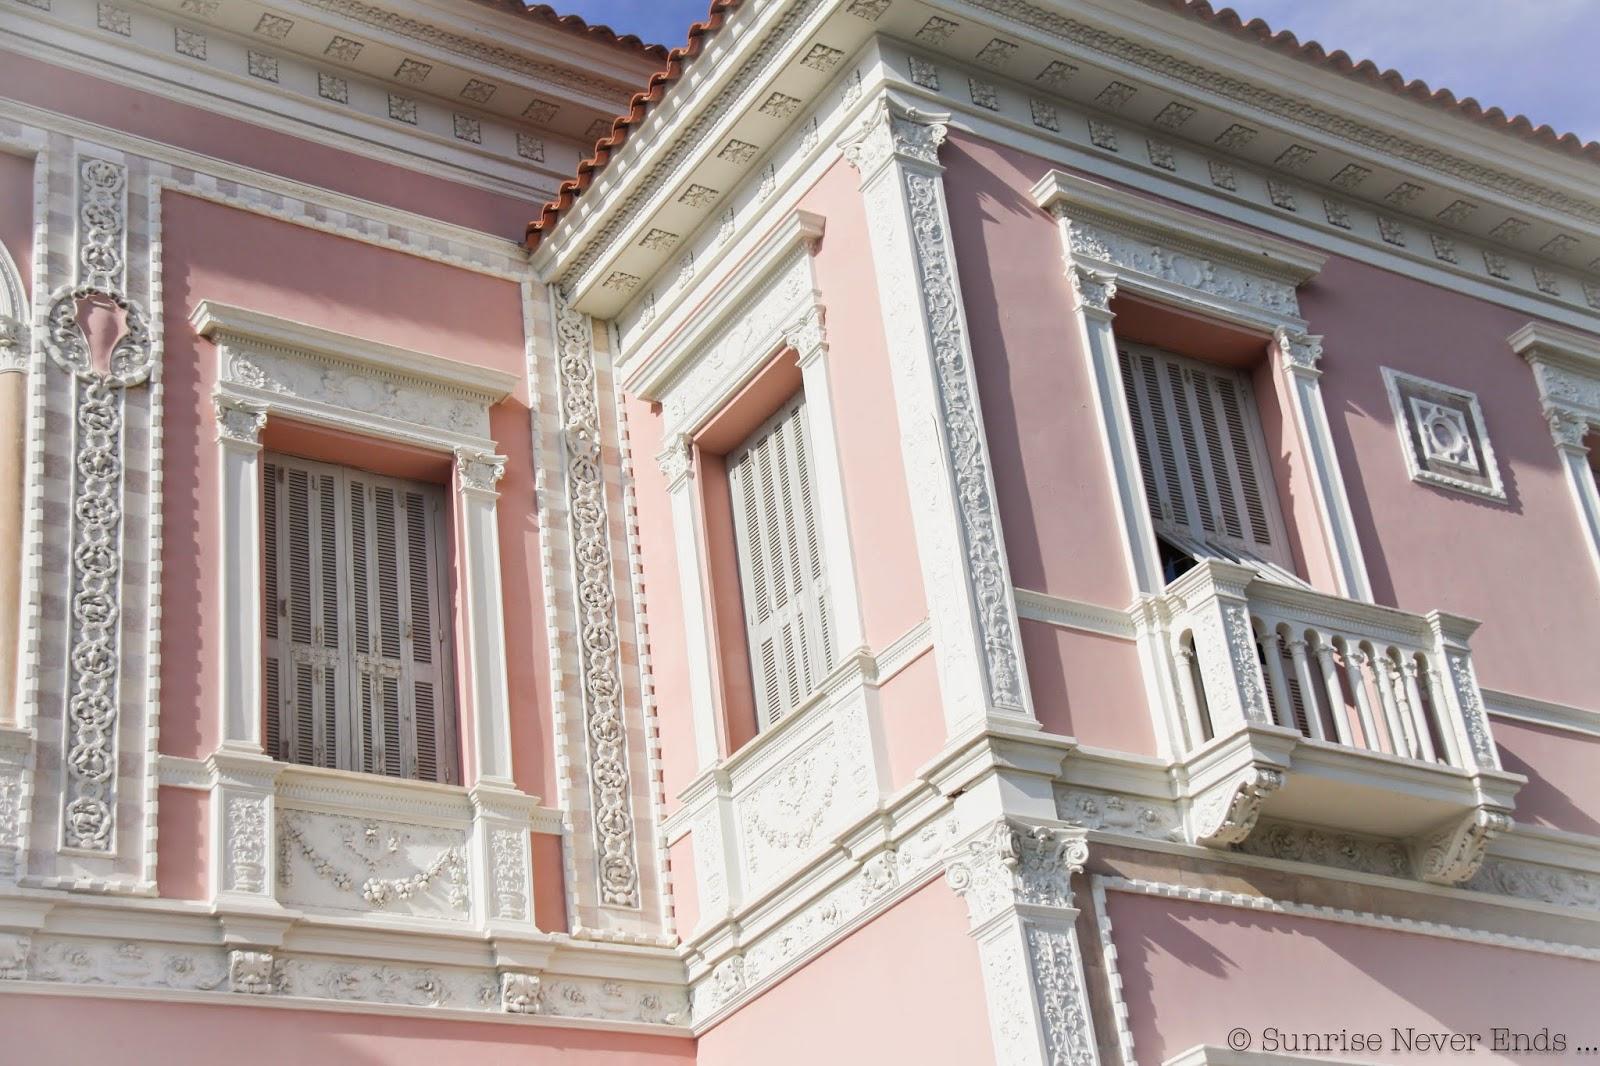 villa ephrussi de rothschild,saint jean cap ferrat,salon de thé,hello riviera,dammann, samba